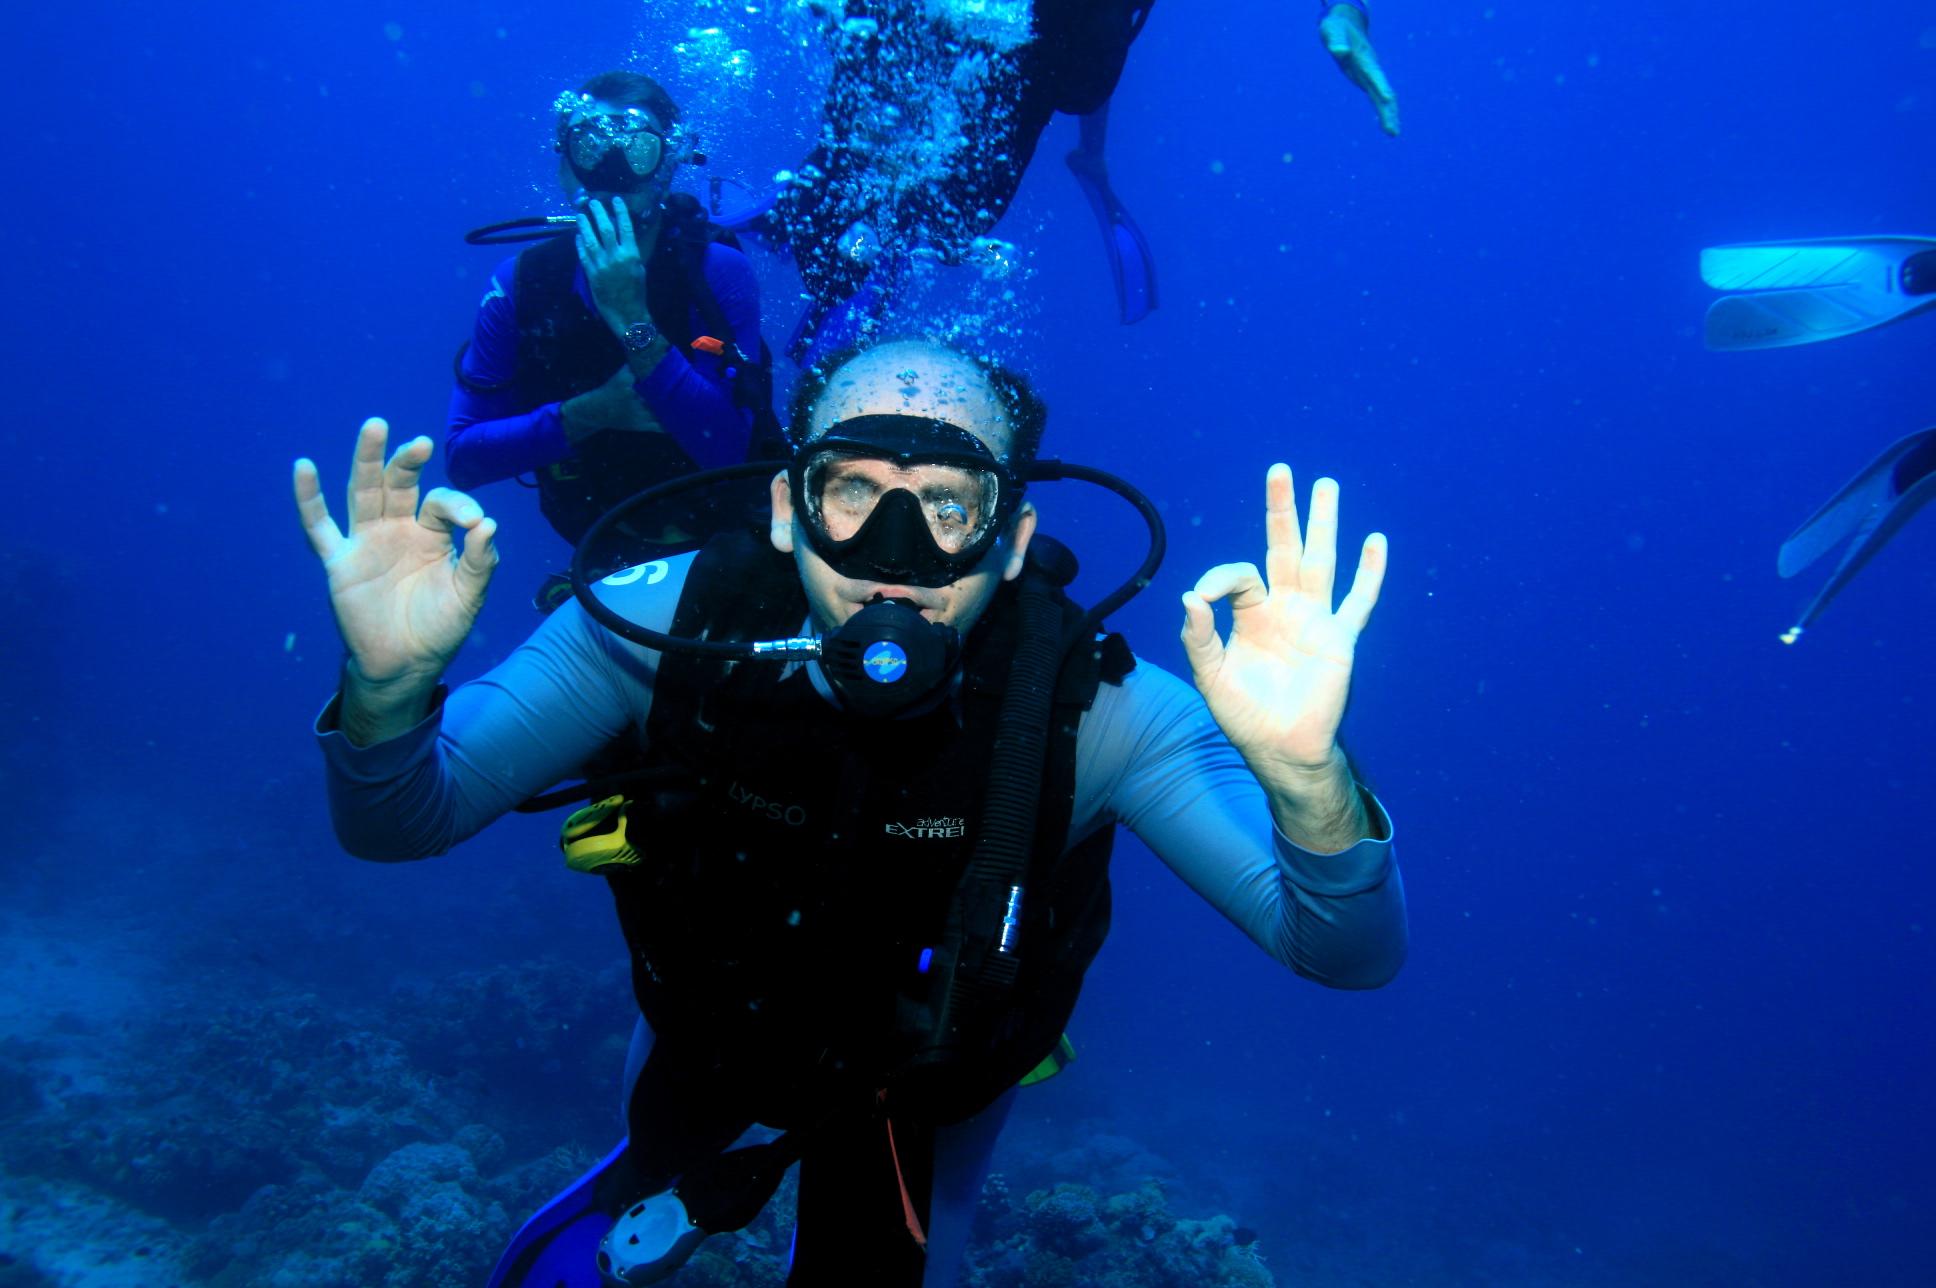 En plongée - Grande Barrière de Corail - Grand Voyage 2008